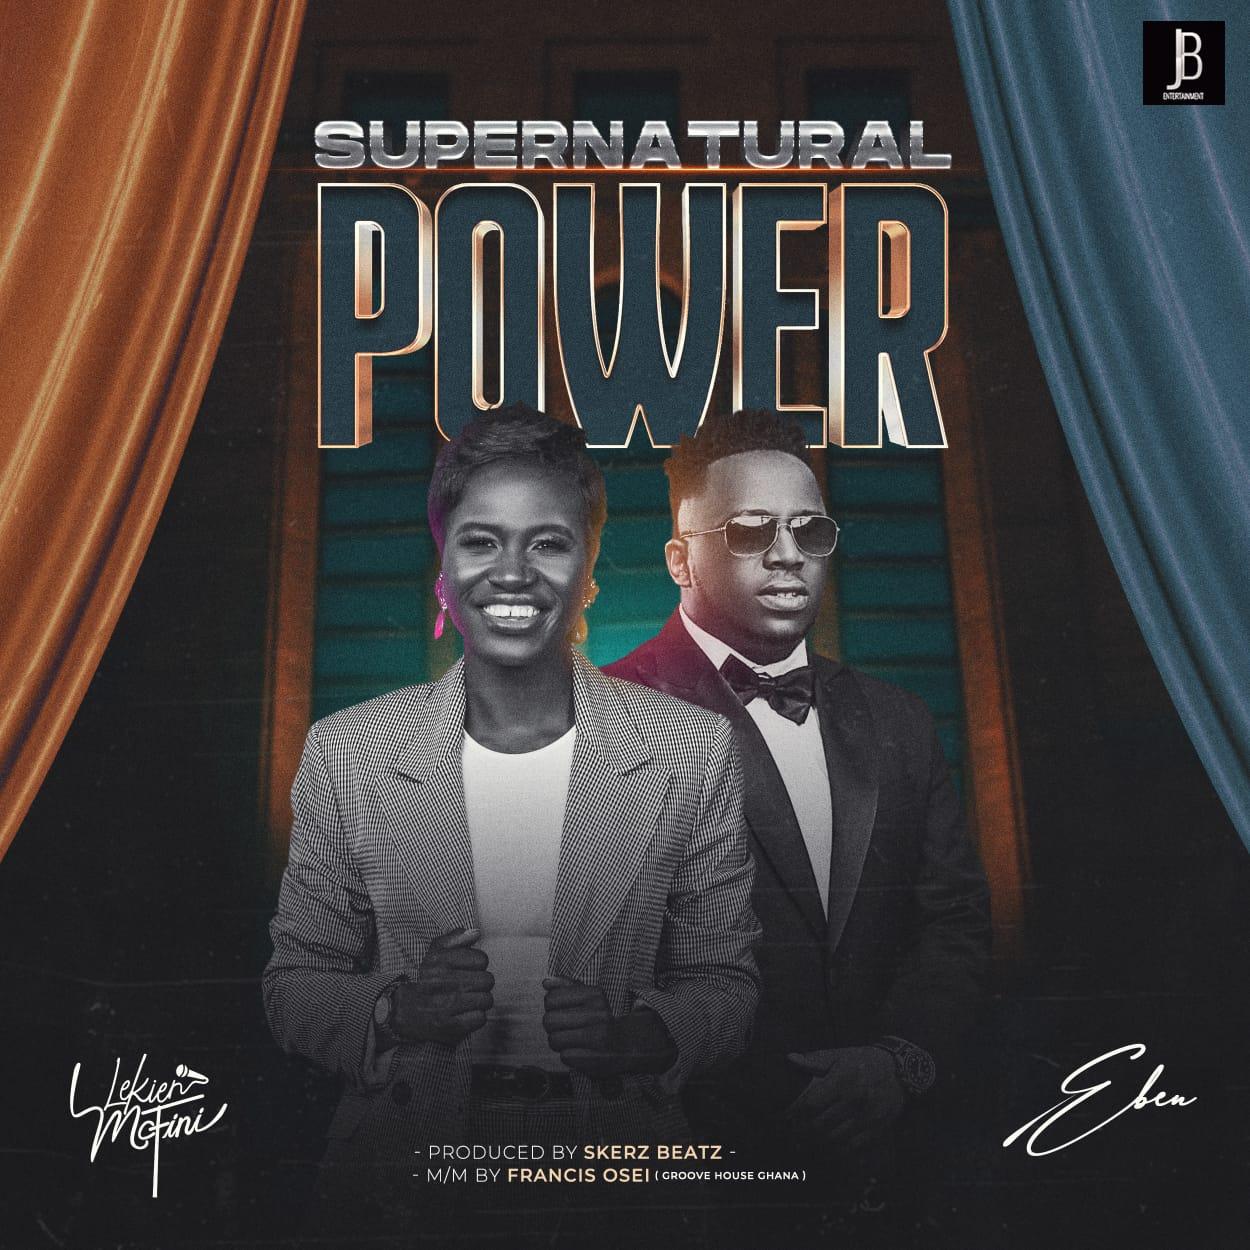 Lekien Mcfini - Supernatural Power ft. Eben